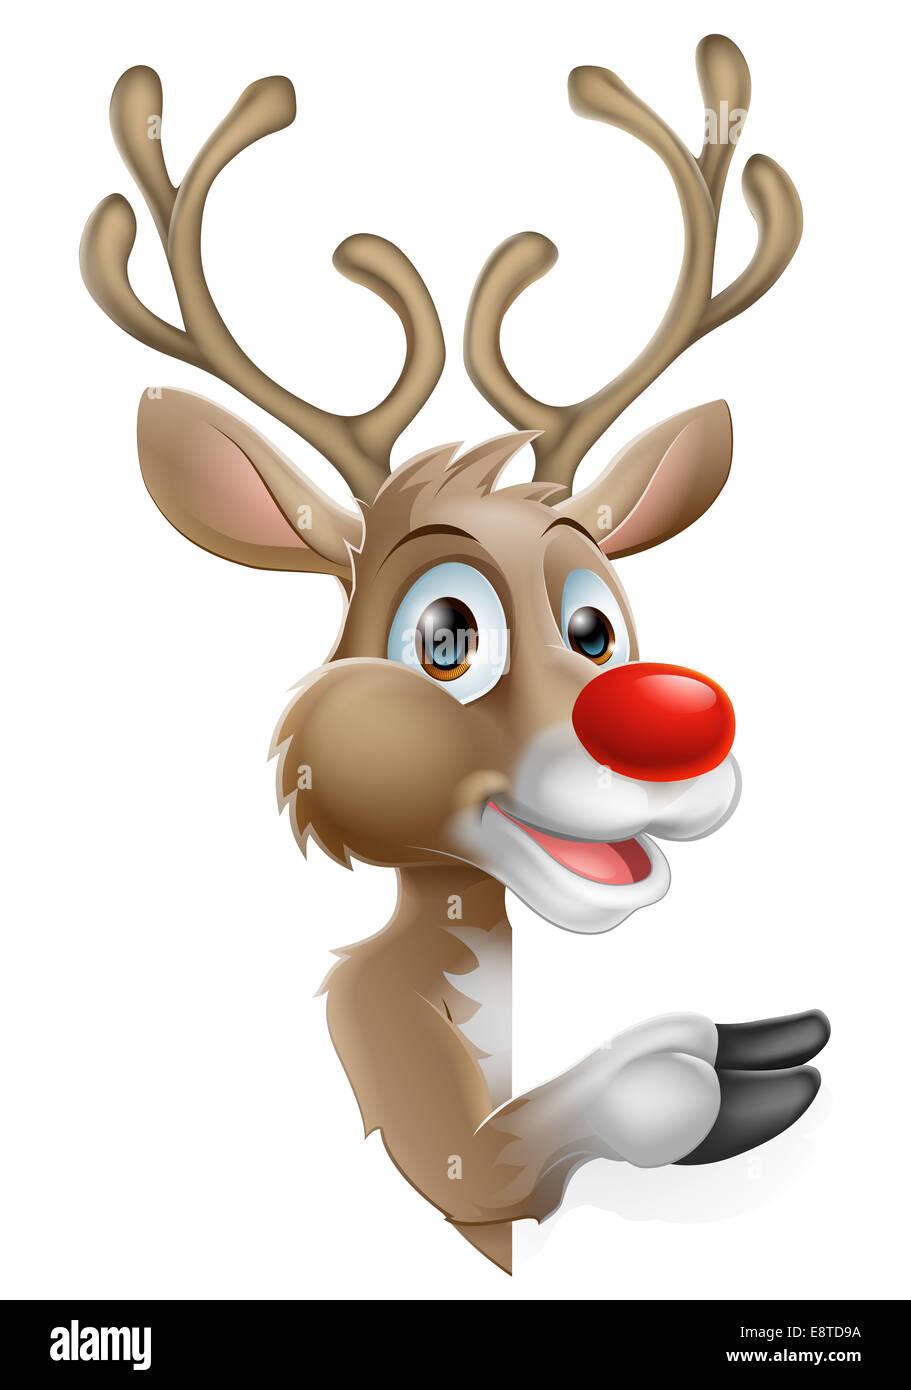 Cartoon Santas Christmas Reindeer peeking around a sign and pointing - Stock Image